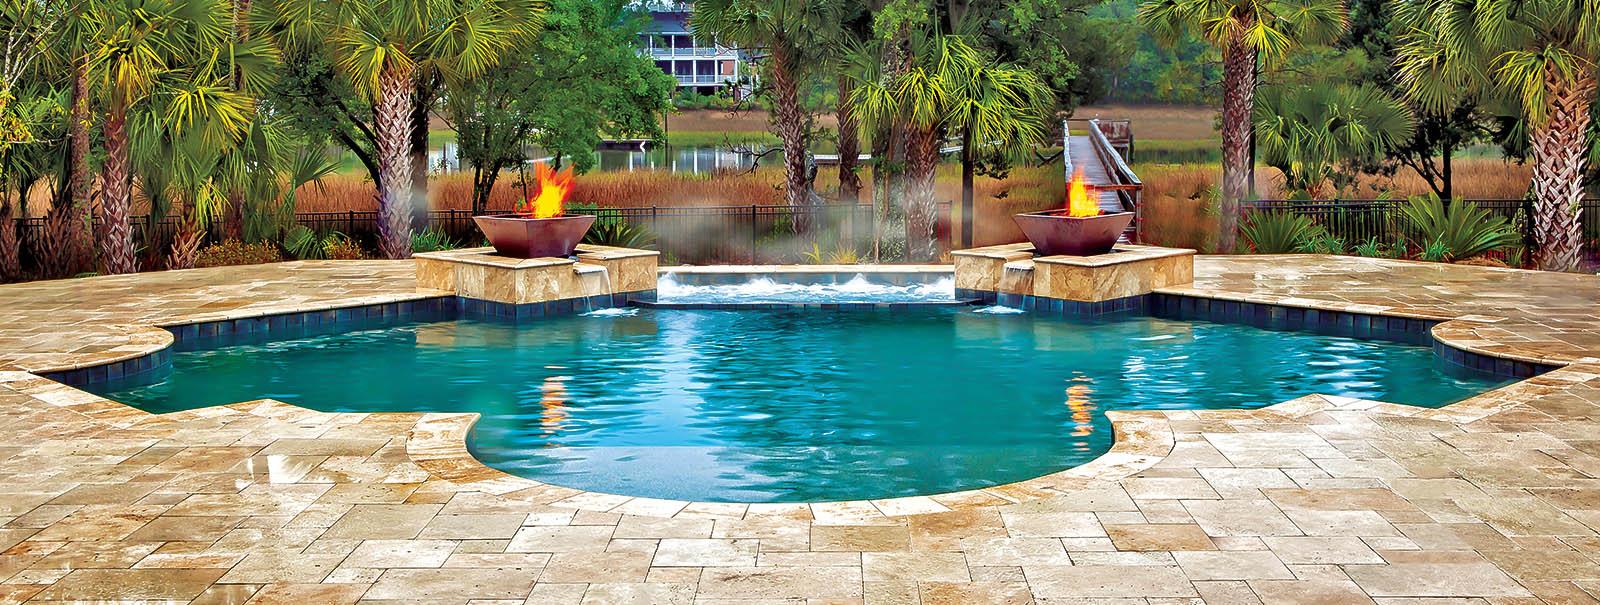 Gulfport Custom Swimming Pool Buildersblue Haven Pools